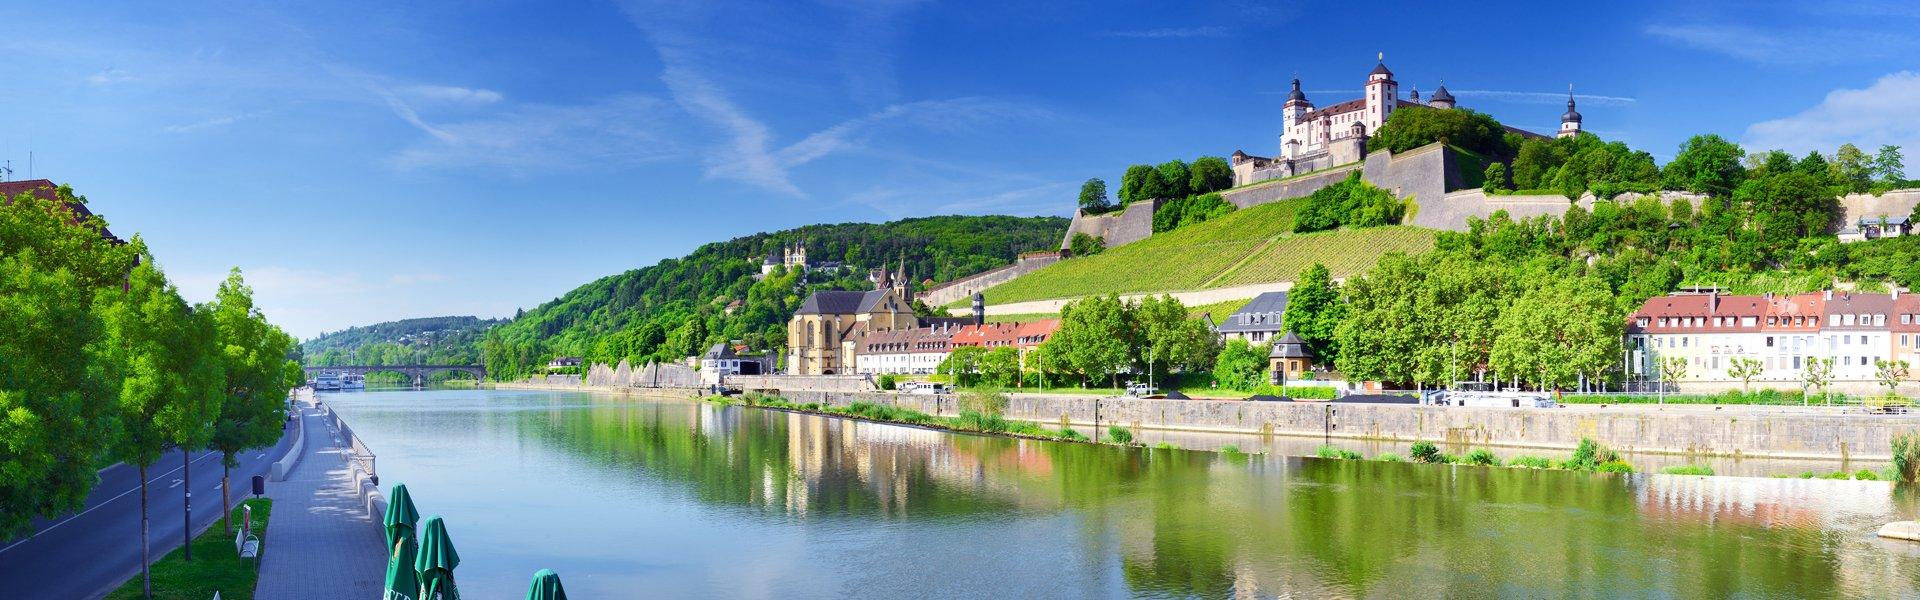 Uitzicht op Würzburg, Duitsland